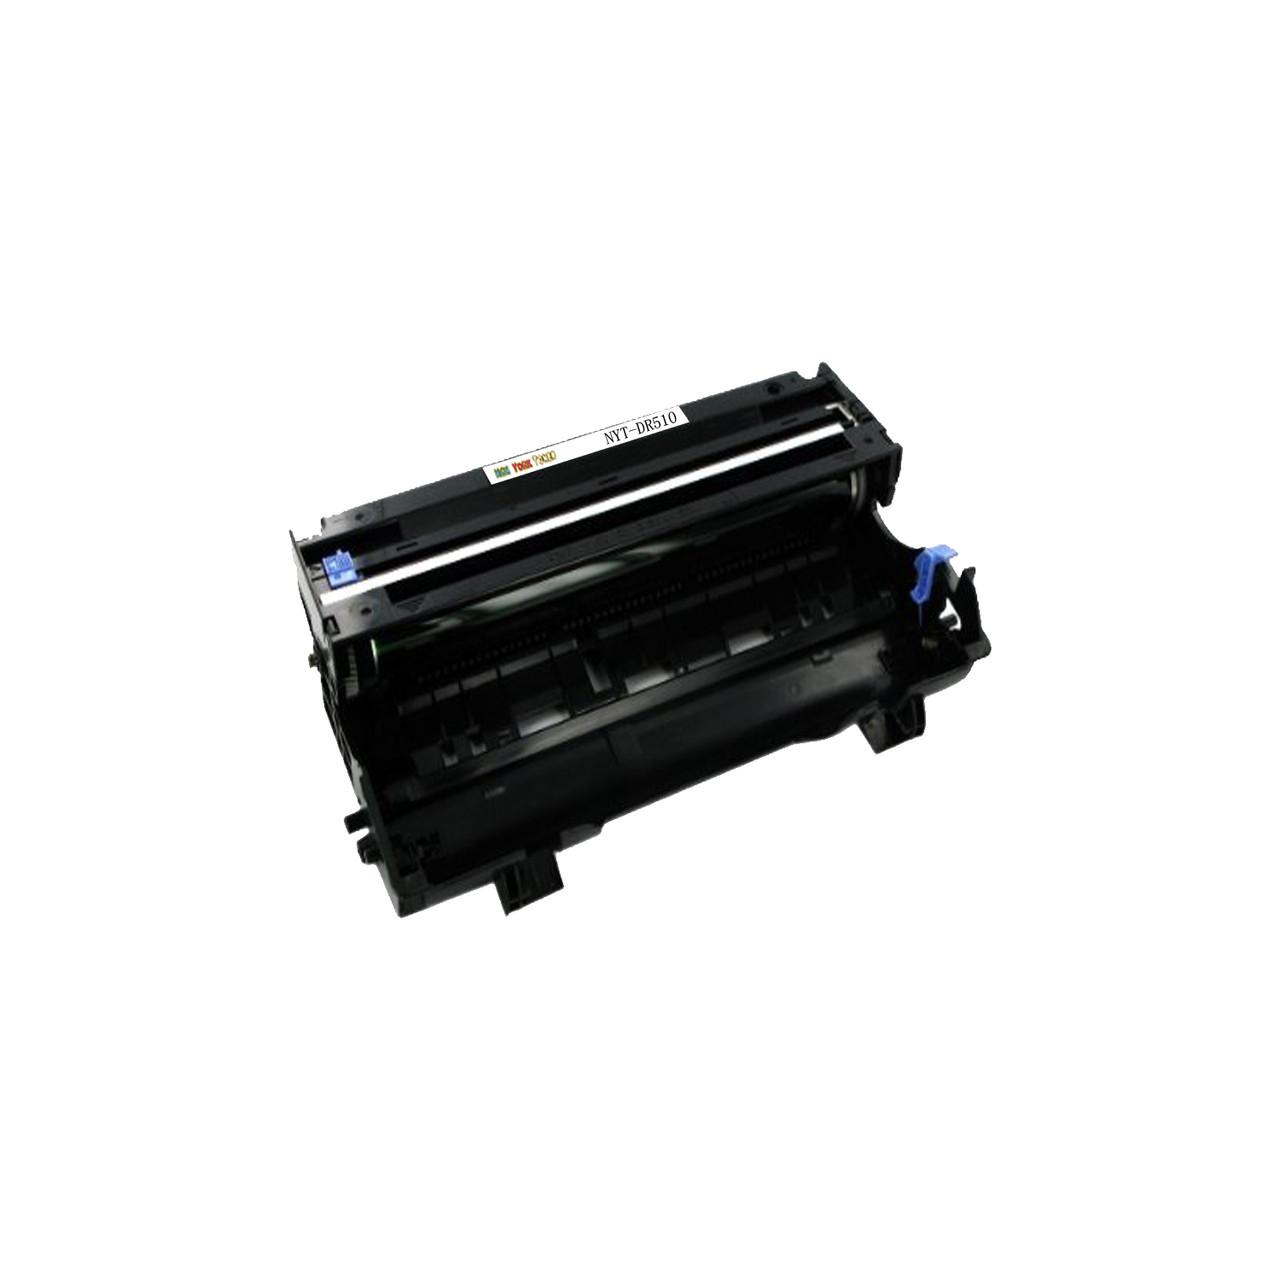 Brother HL-5170DN Printer Treiber Windows 10